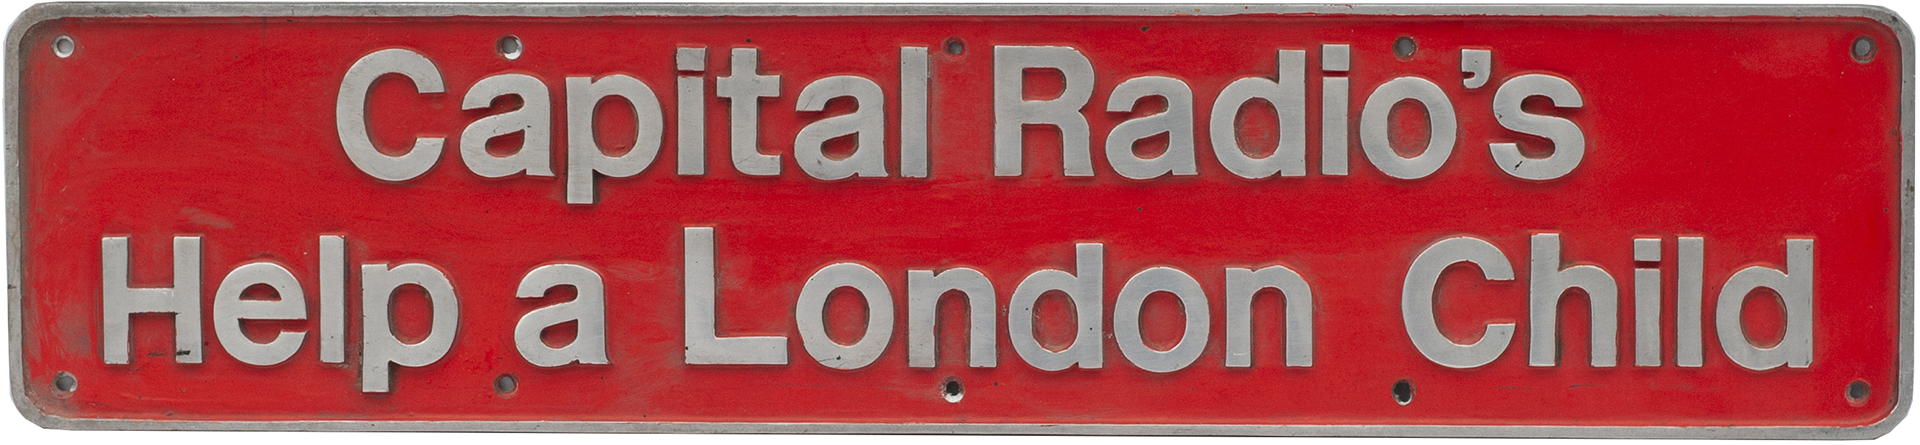 Nameplate CAPITAL RADIO'S HELP A LONDON CHILD Ex